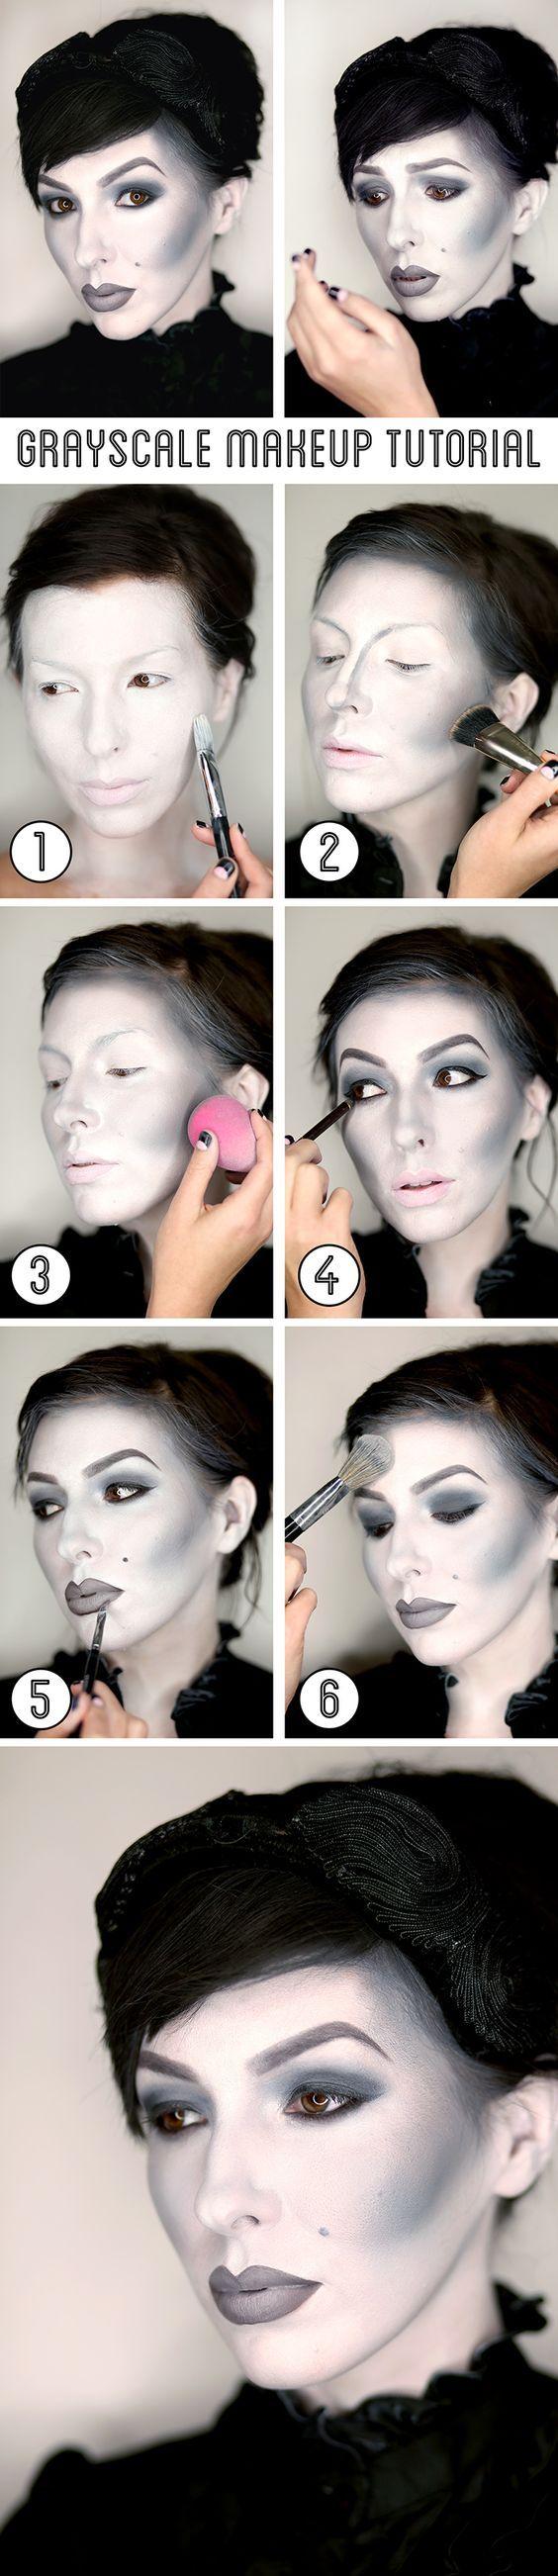 Keiko Lynn's grayscale makeup tutorial / black and white Halloween makeup.: